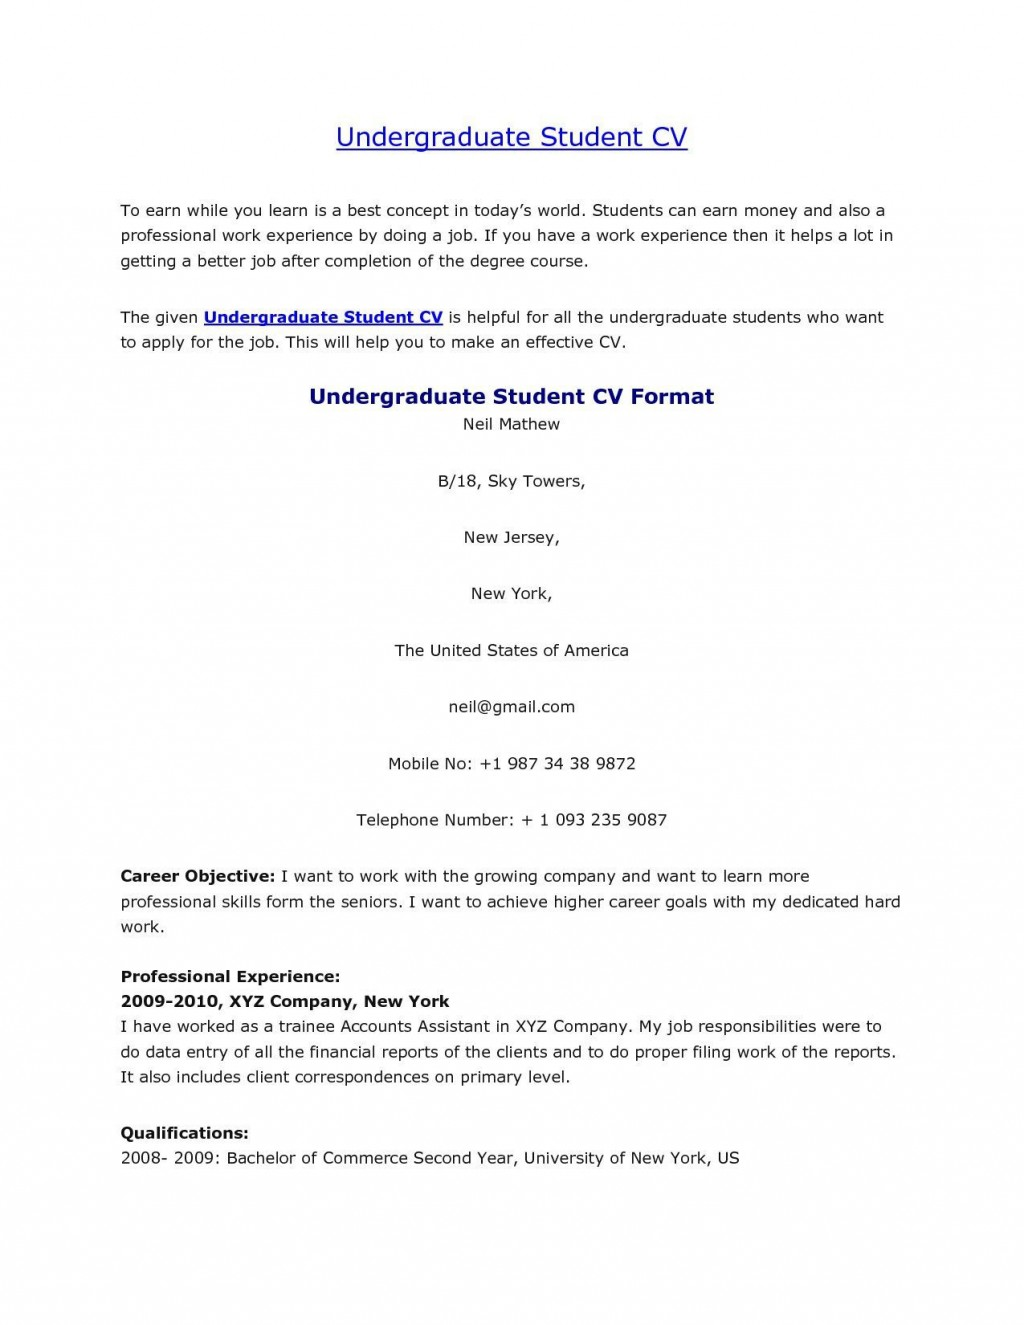 004 Rare Undergraduate Student Cv Template Sample  Pdf DownloadLarge